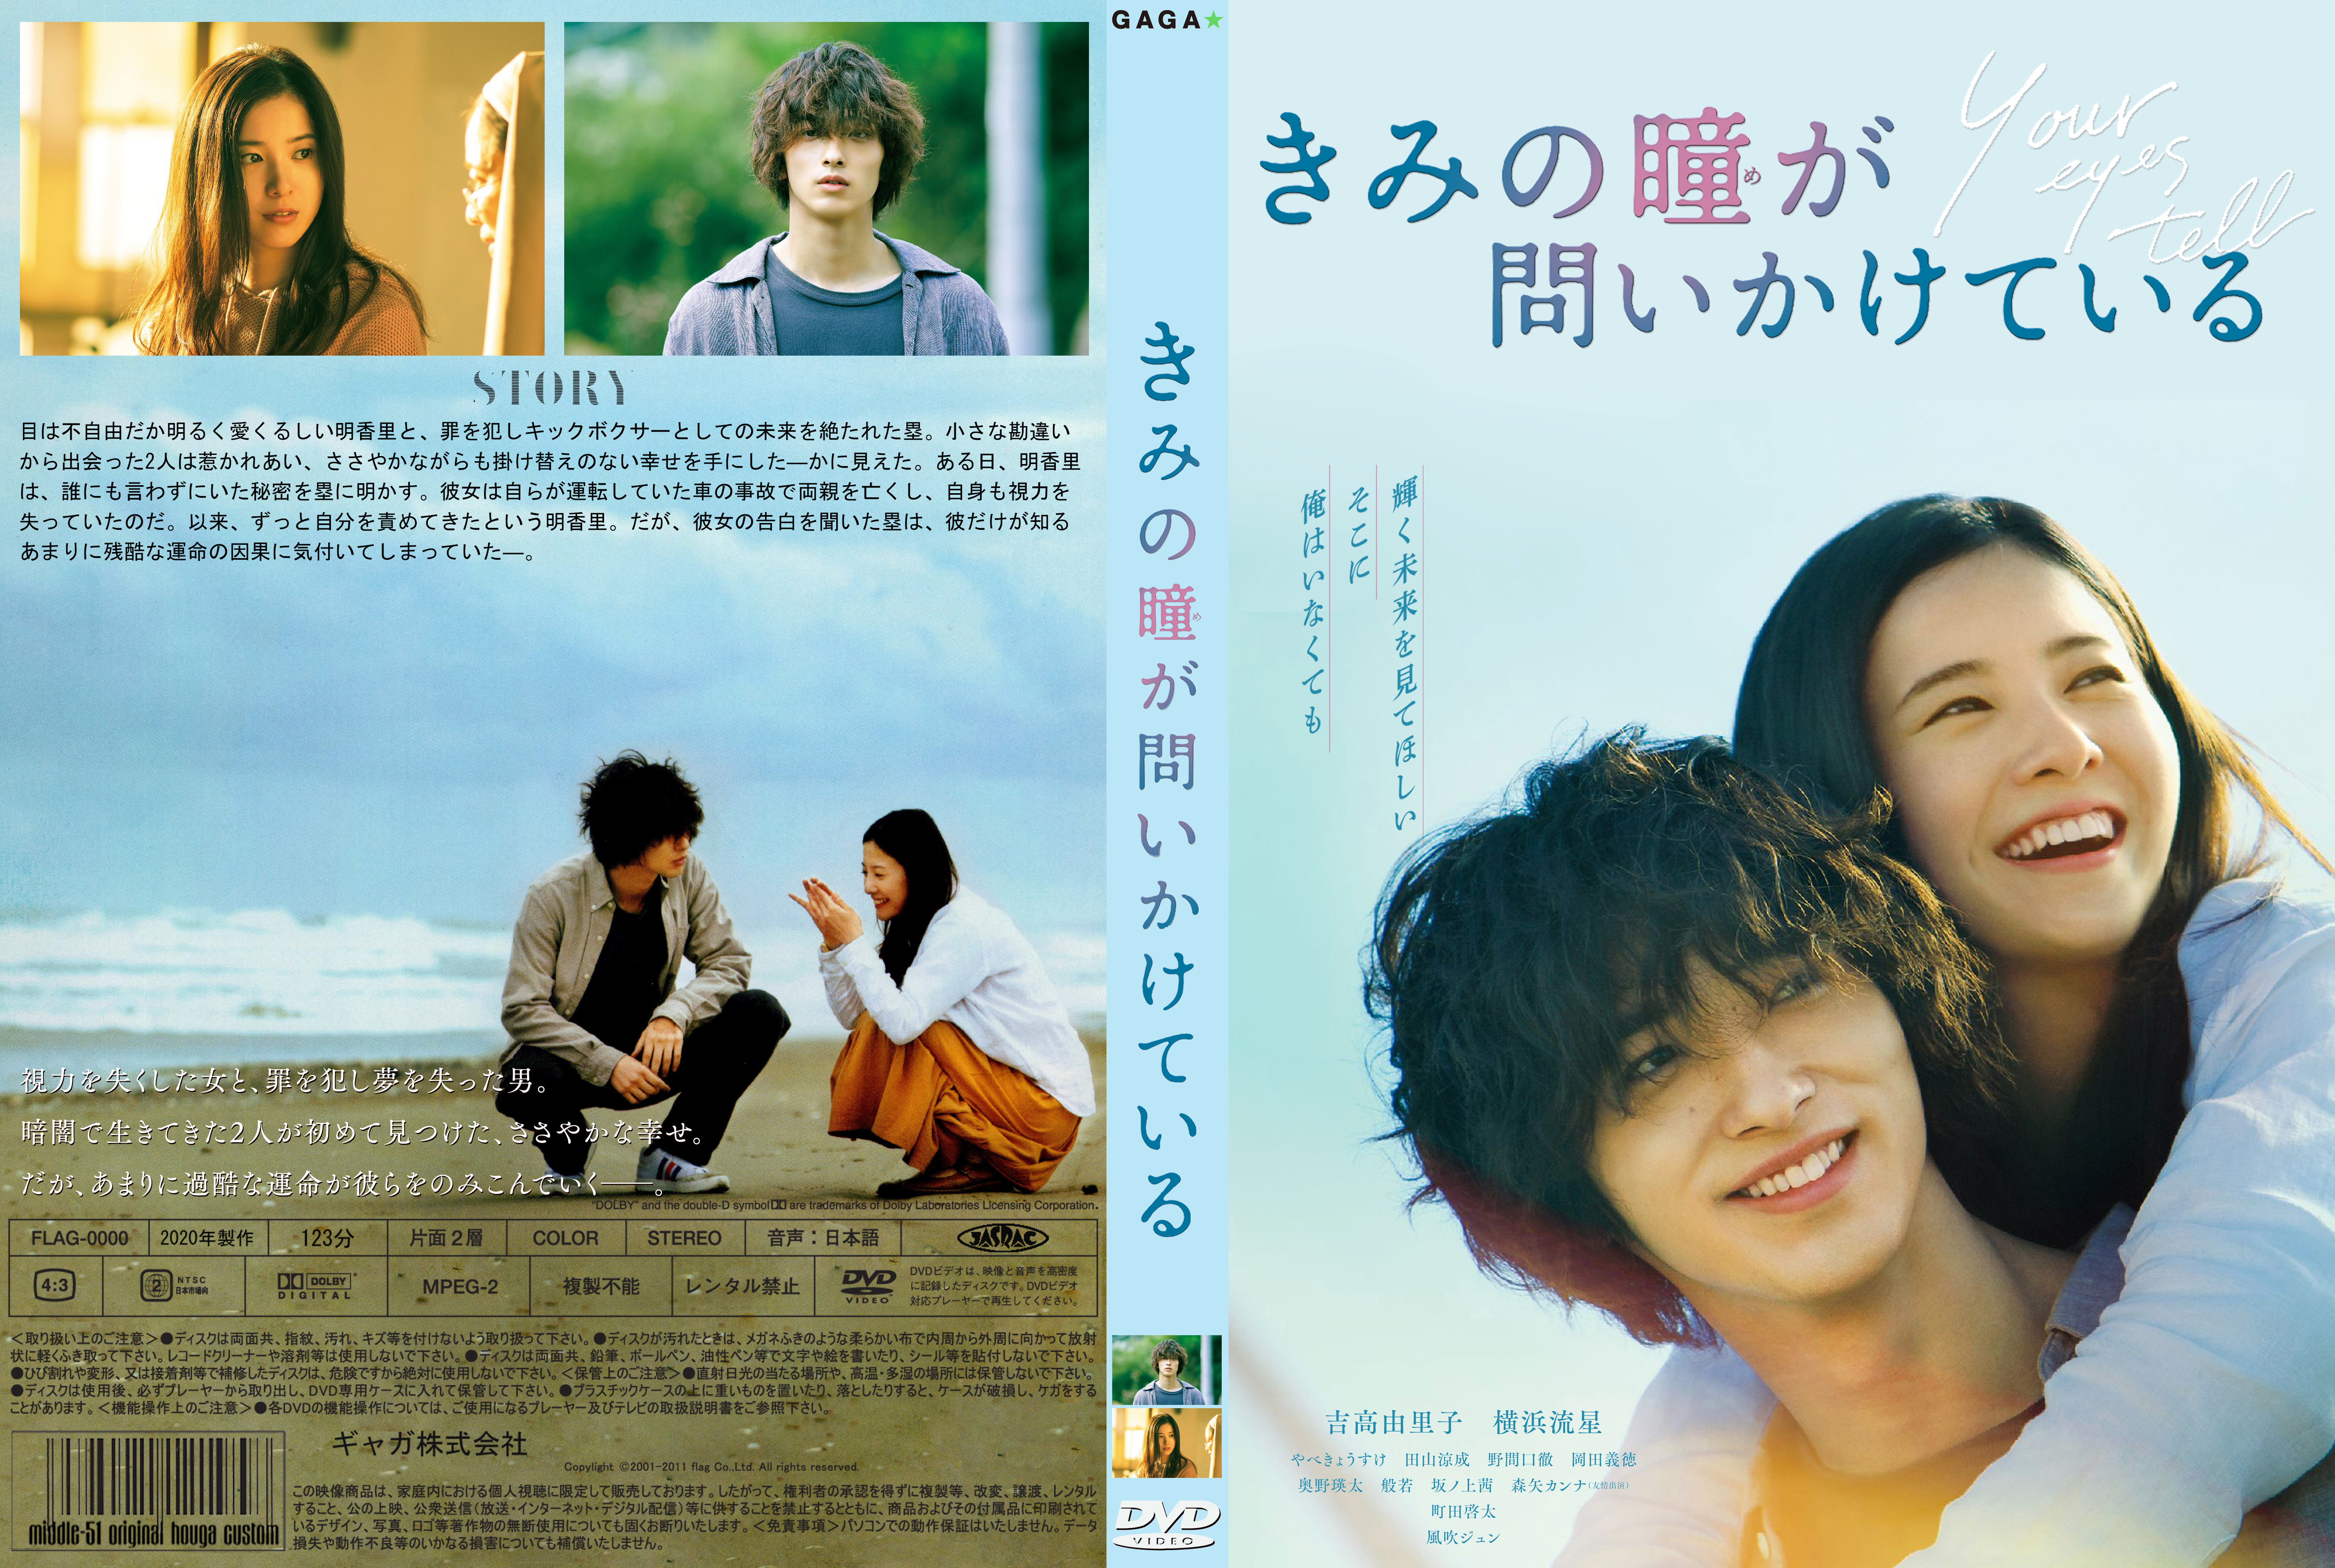 DVD 14mmジャケット 1